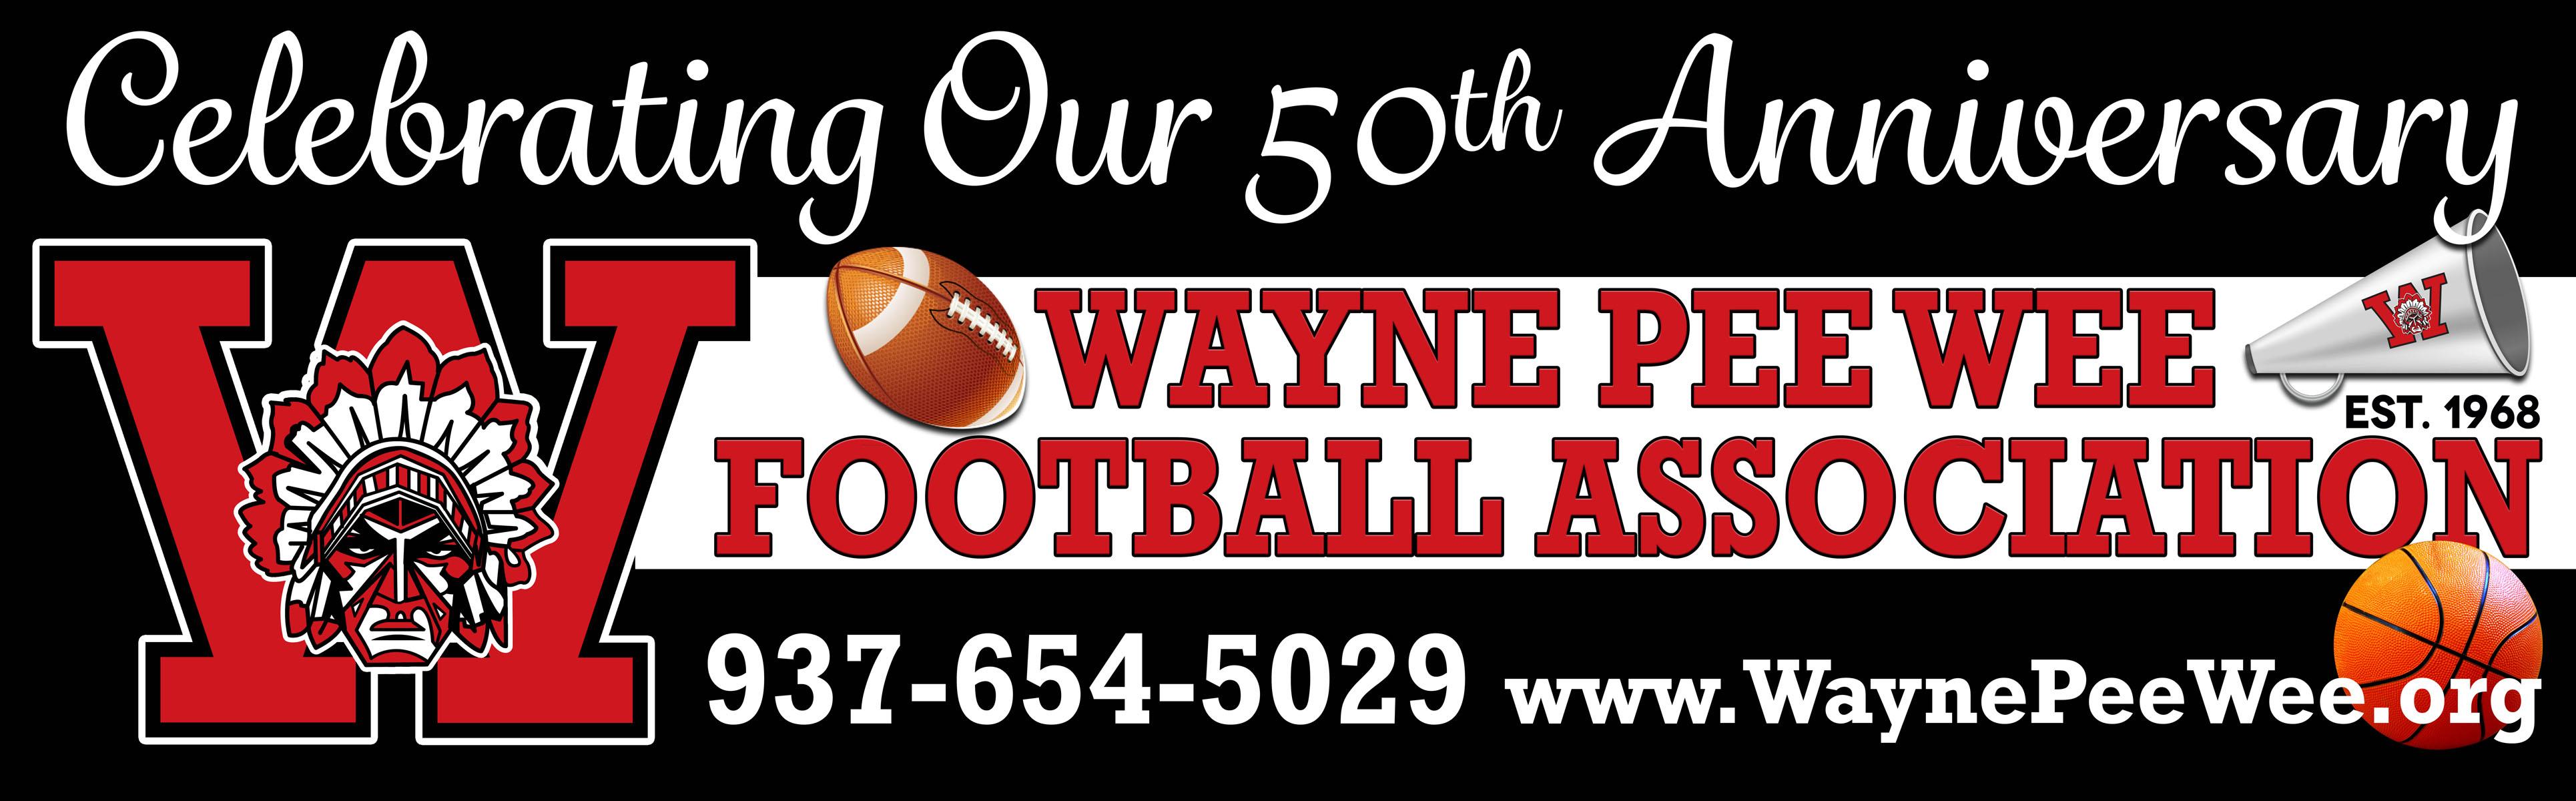 Wayne pee wee 50th master copy 6 21 2018 2ba7f